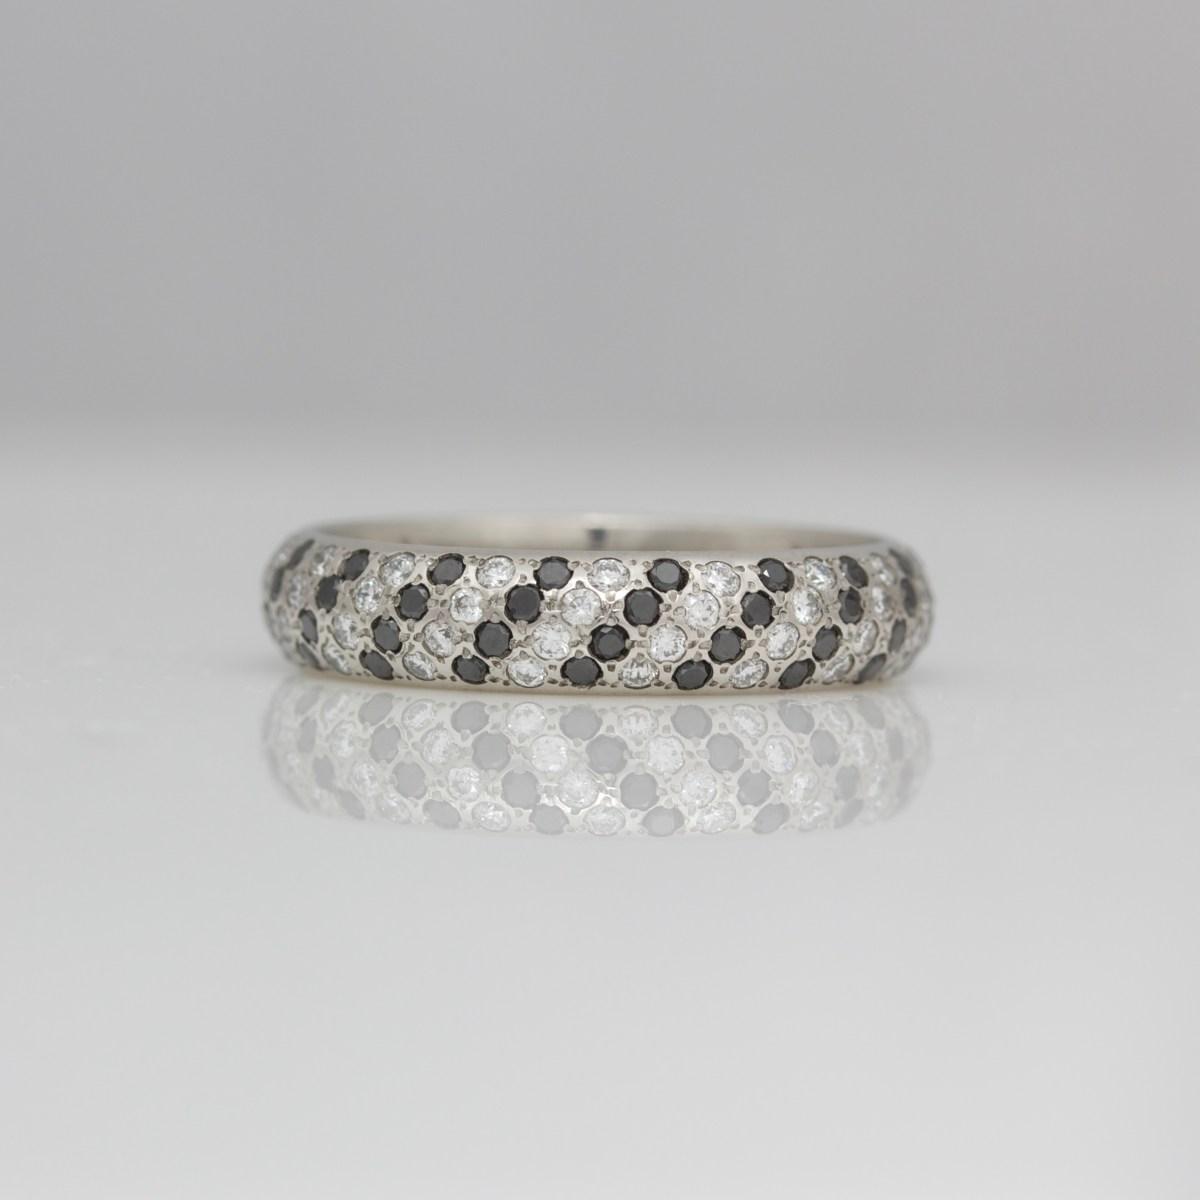 Rubies & black diamonds pavé set in platinum ring DAVID ASHTON